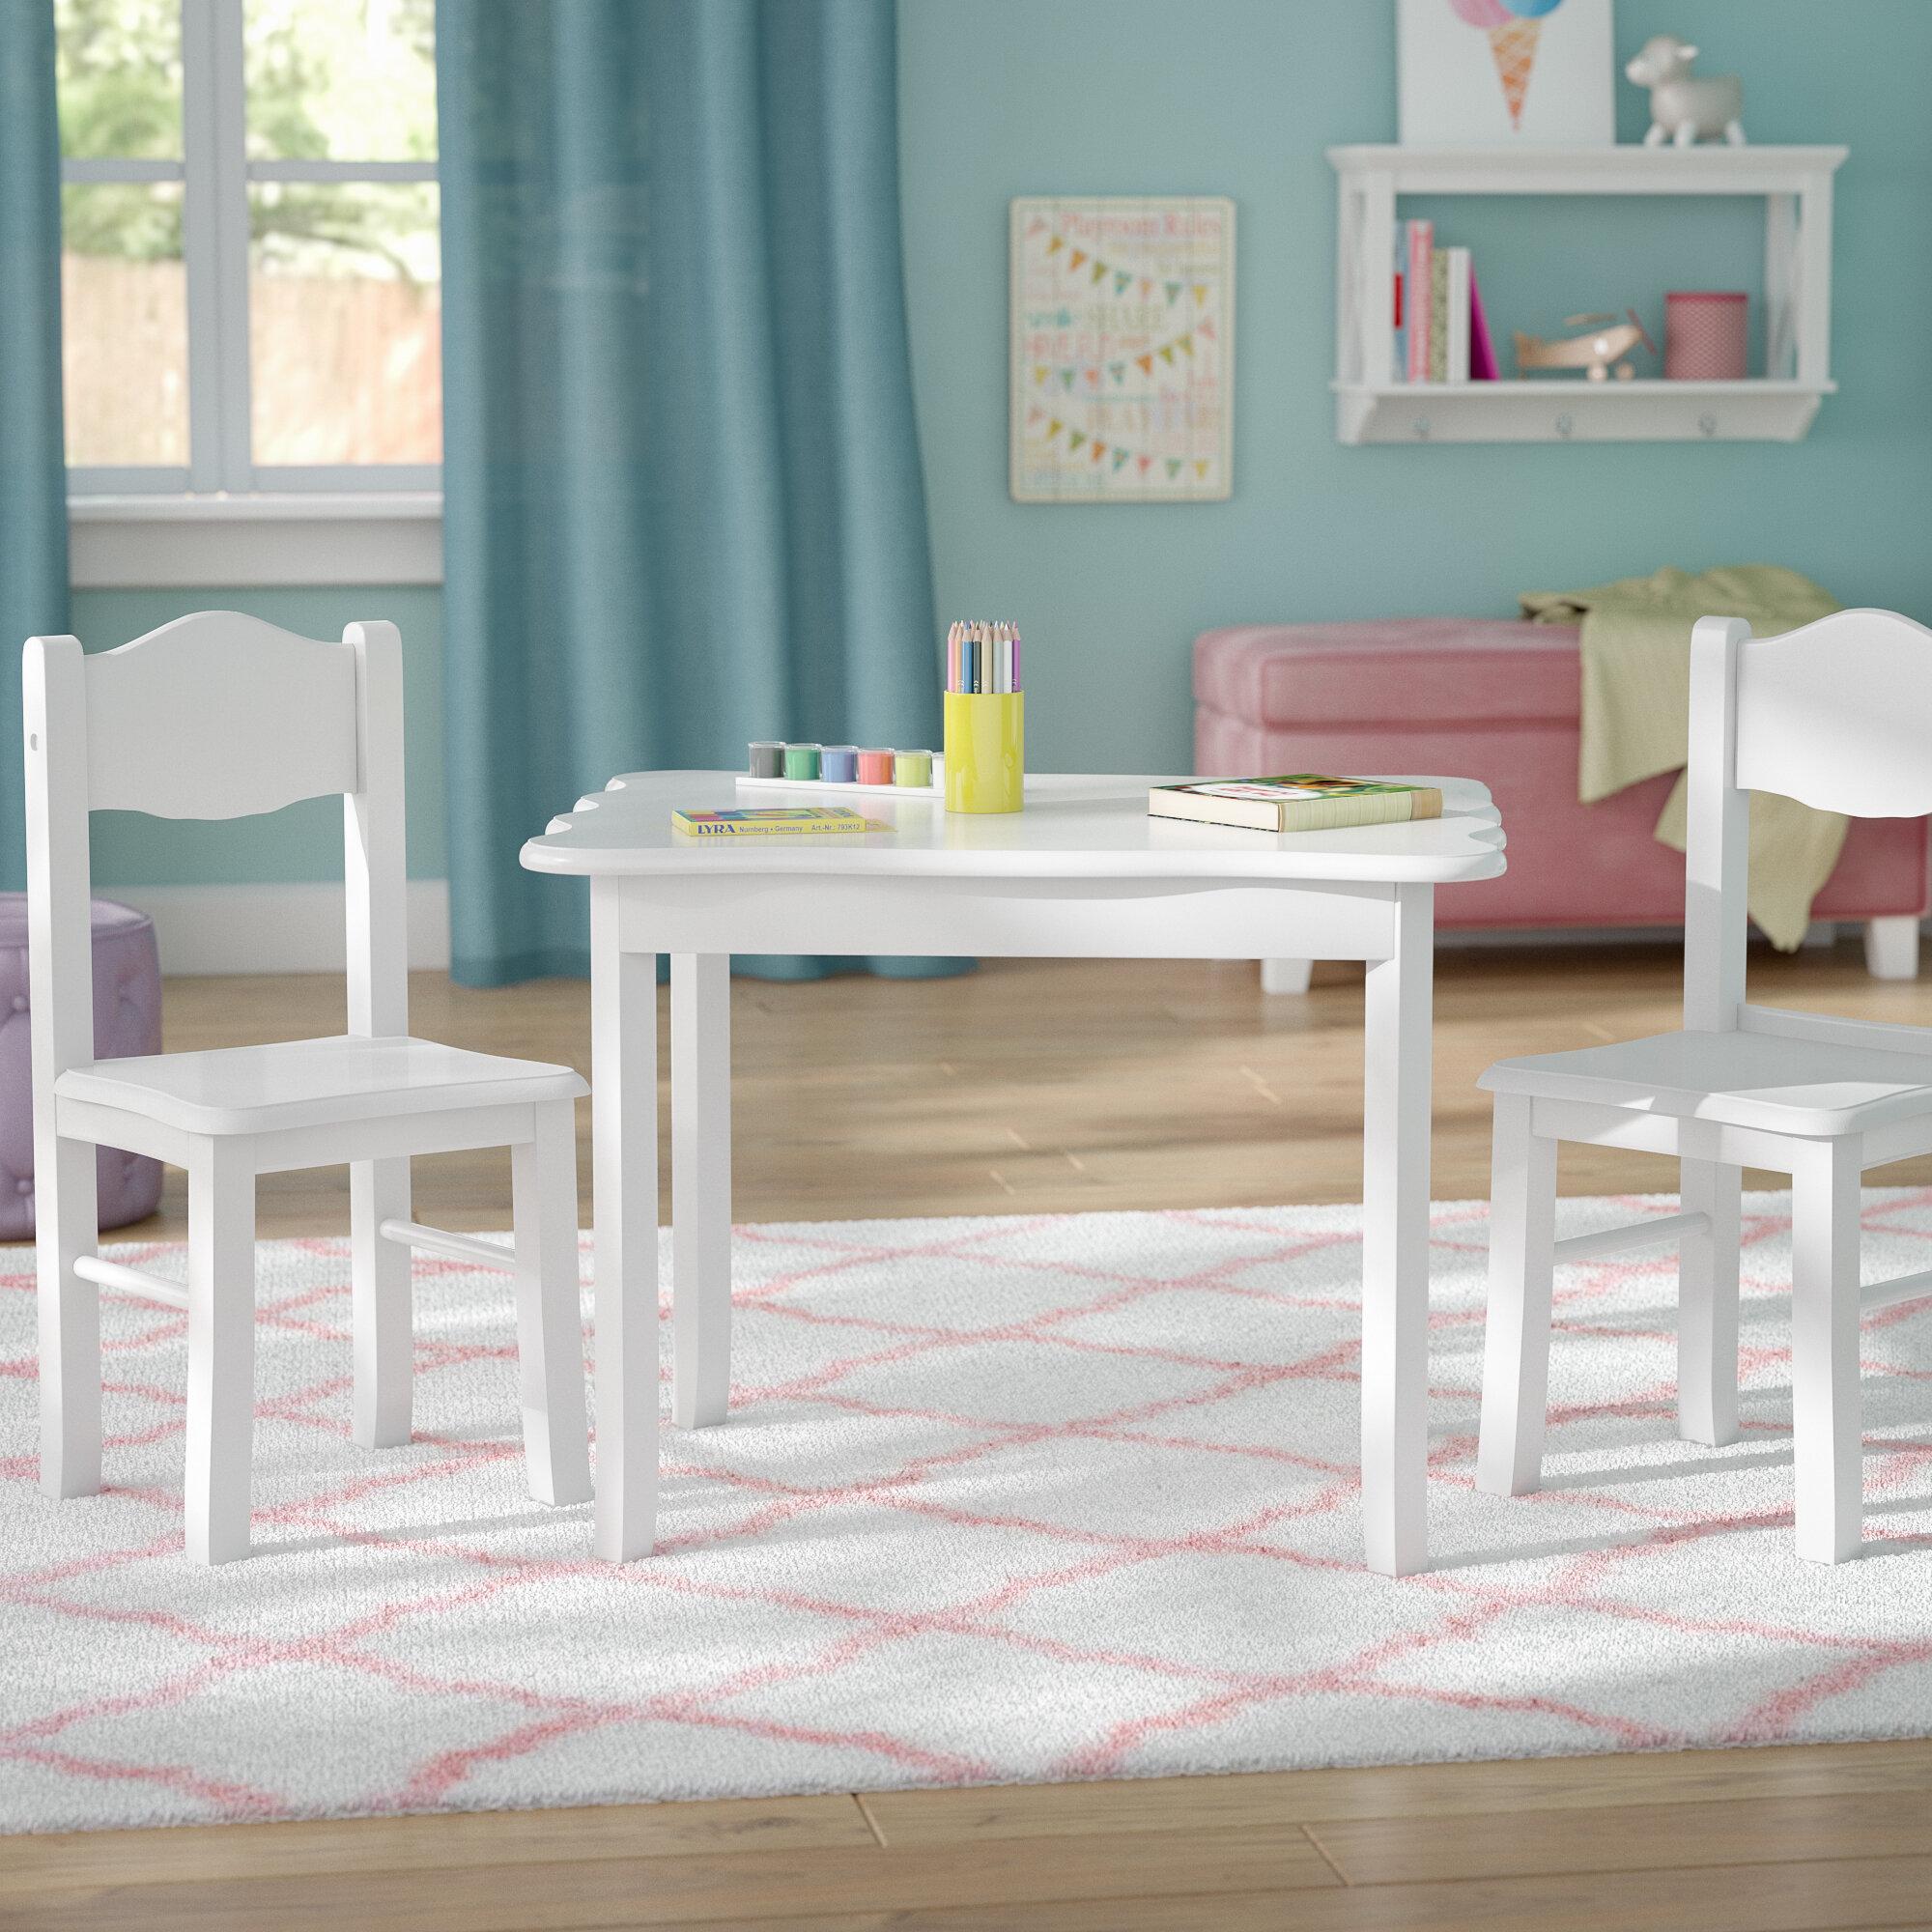 Viv + Rae Matilda Kids\' 3 Piece Table and Chair Set & Reviews | Wayfair